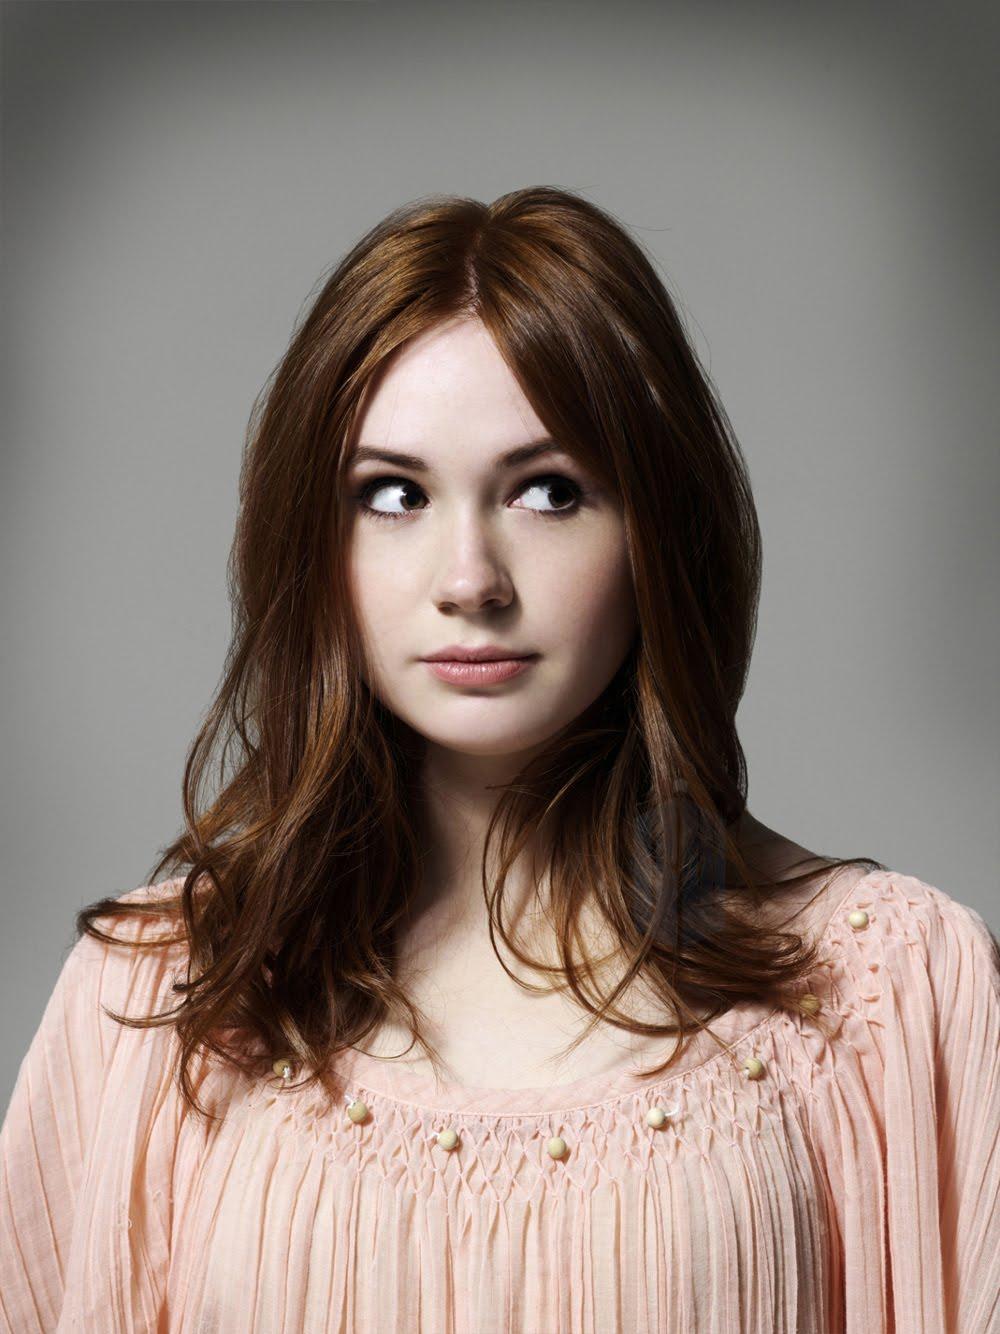 So it goes redhead day - Karen gillan pictures ...